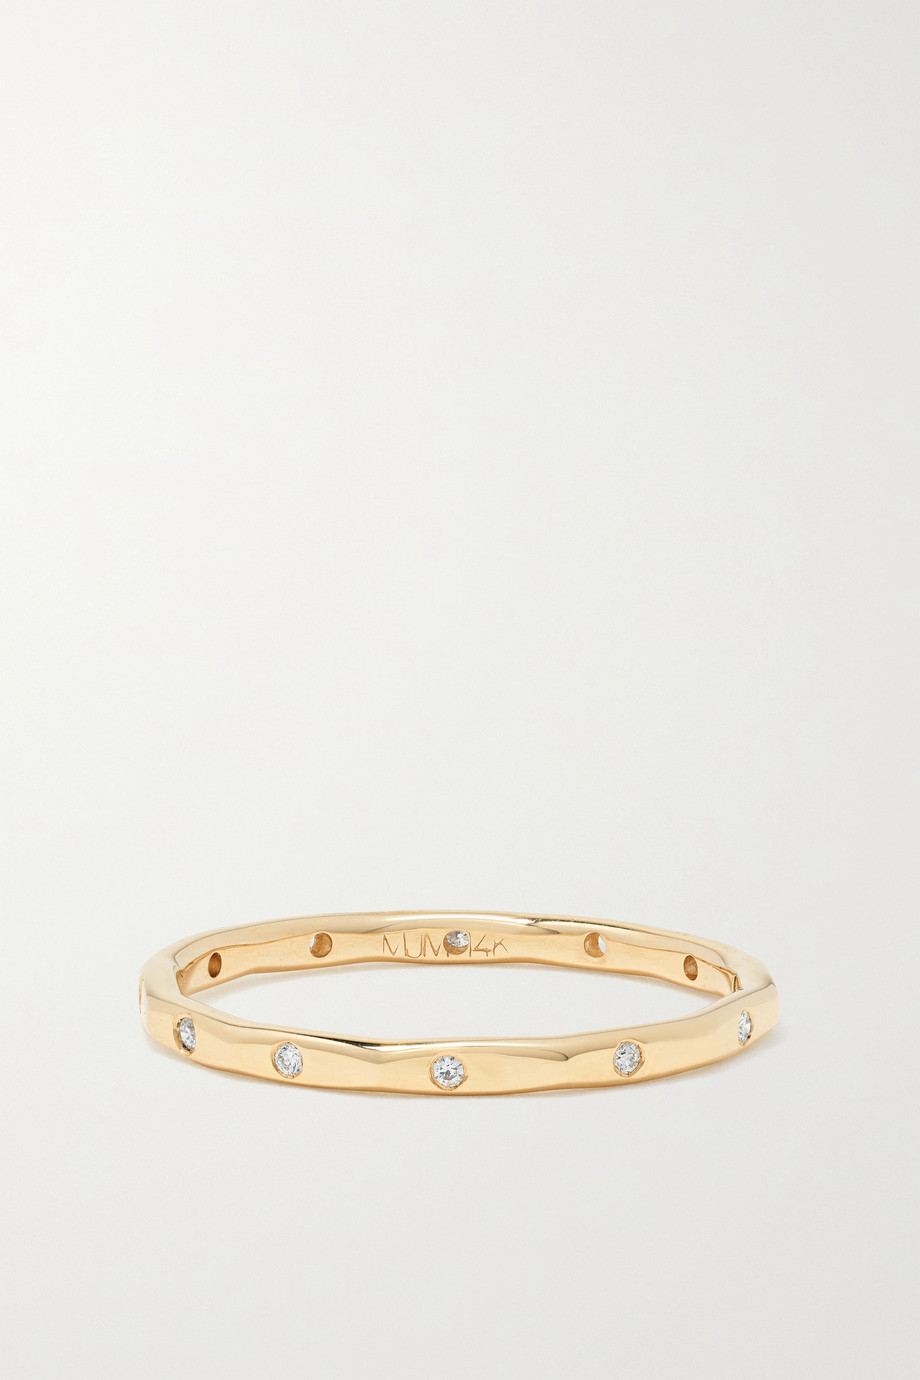 Melissa Joy Manning Ring aus 14 Karat Gold mit Diamanten